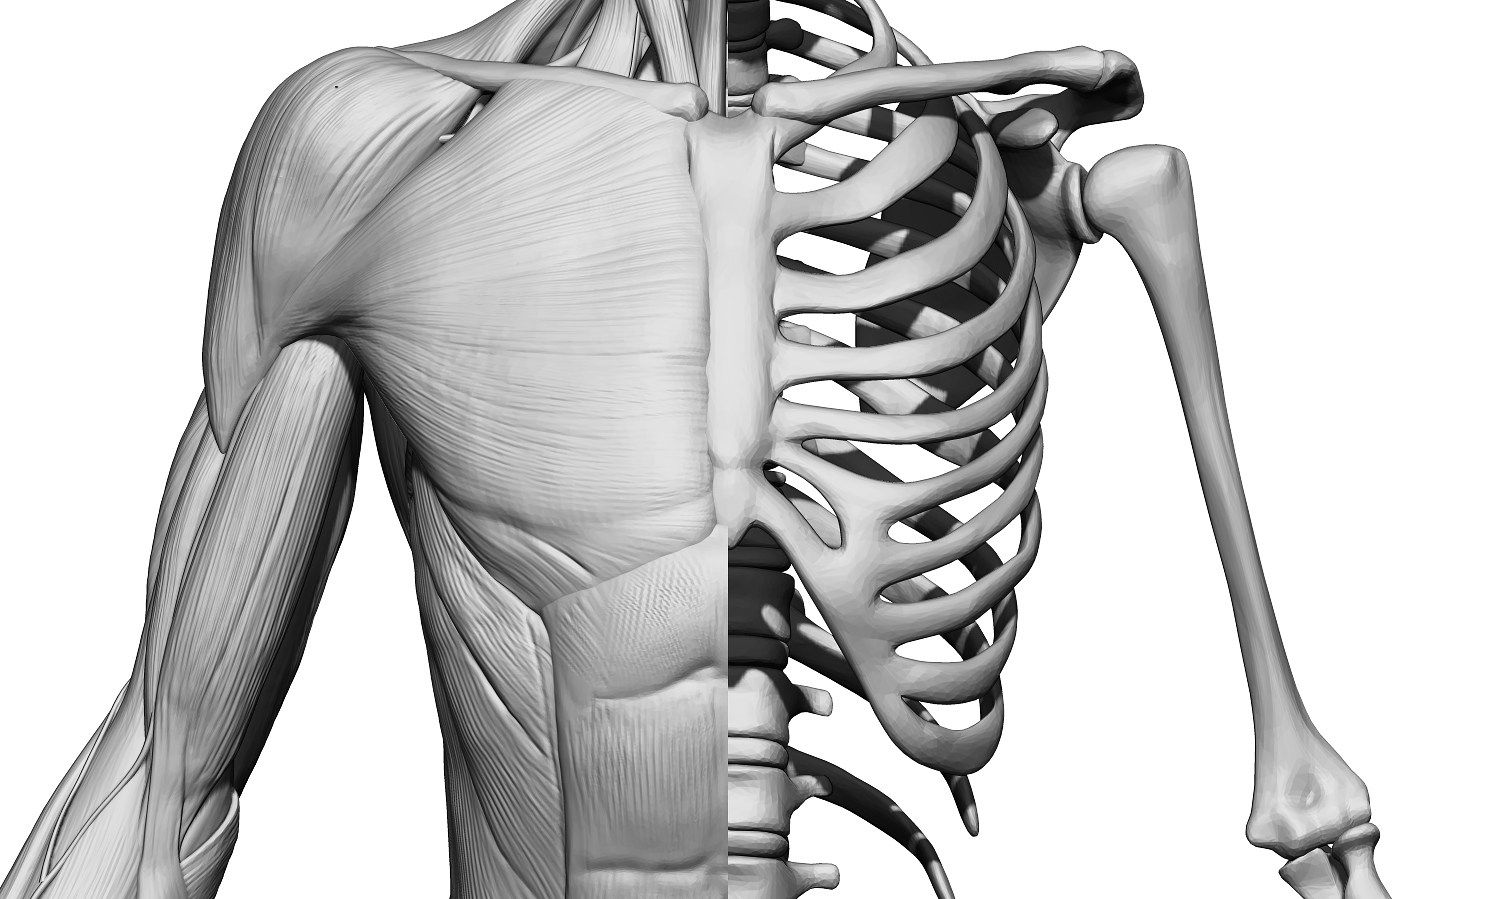 Torso Muscle Anatomy Anatomy Study Human Pinterest Muscle